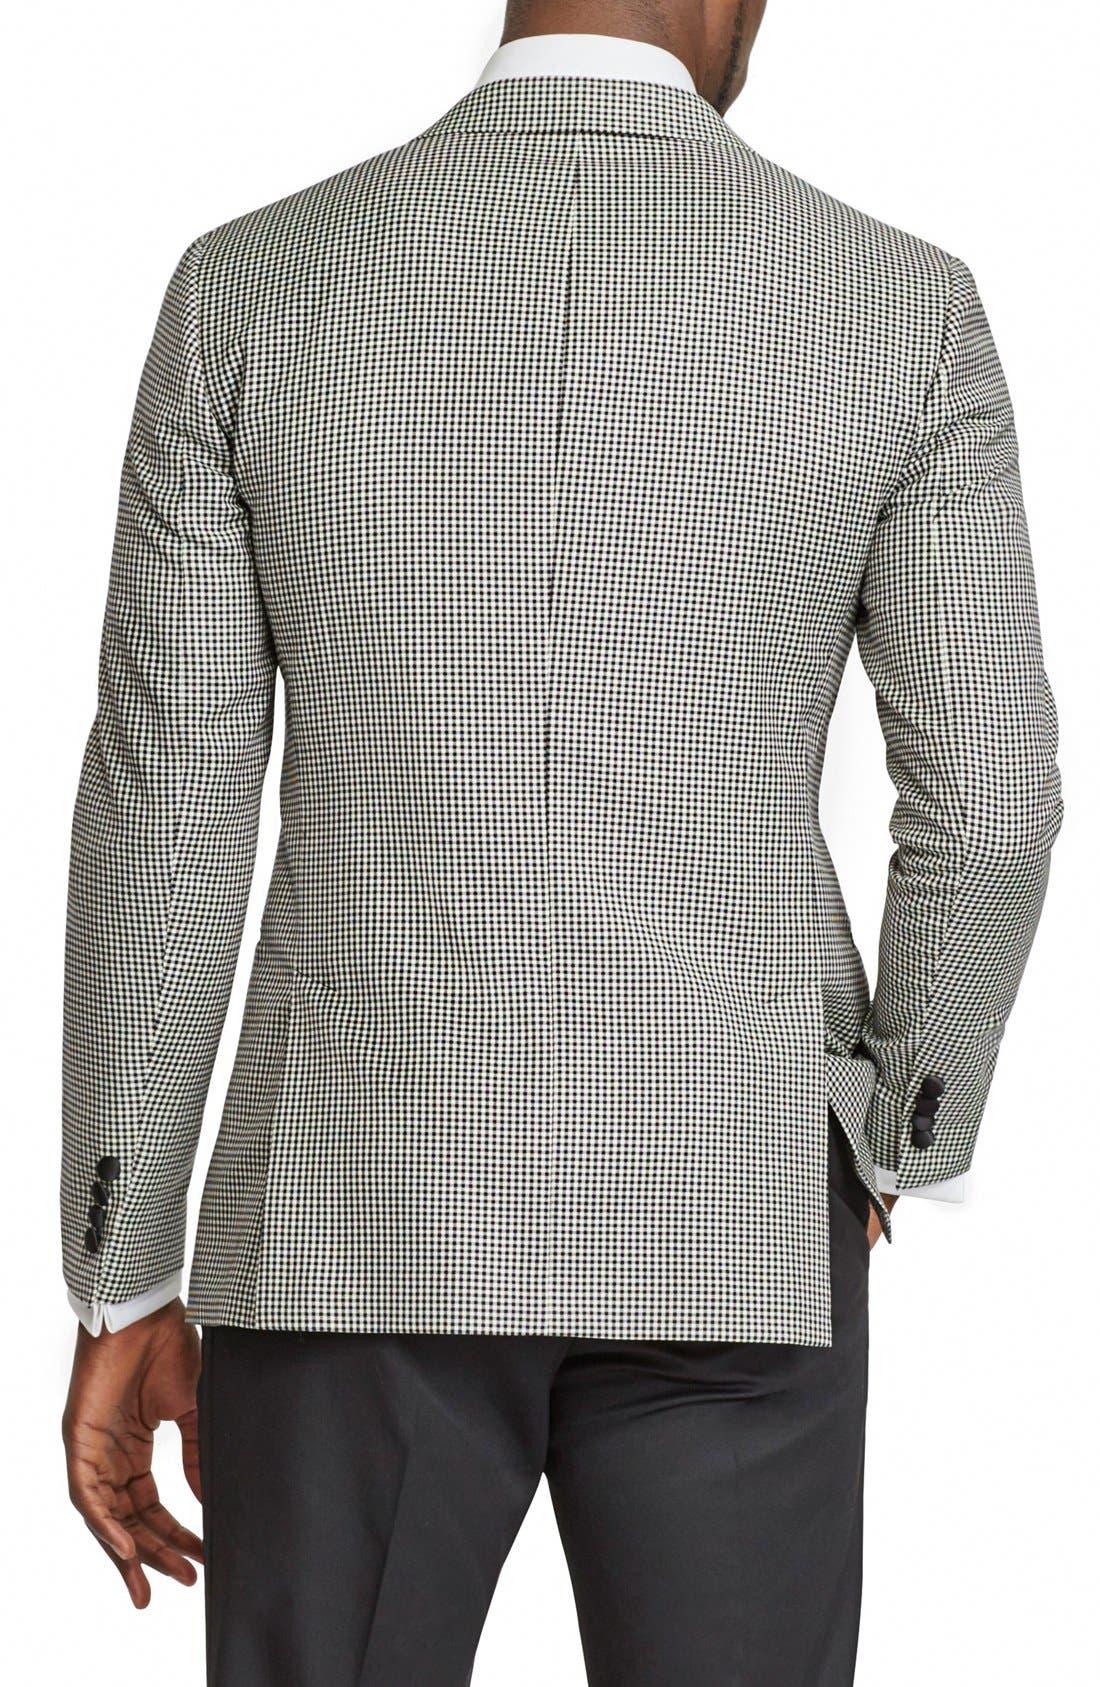 BONOBOS, Trim Fit Check Wool Dinner Jacket, Alternate thumbnail 4, color, 001